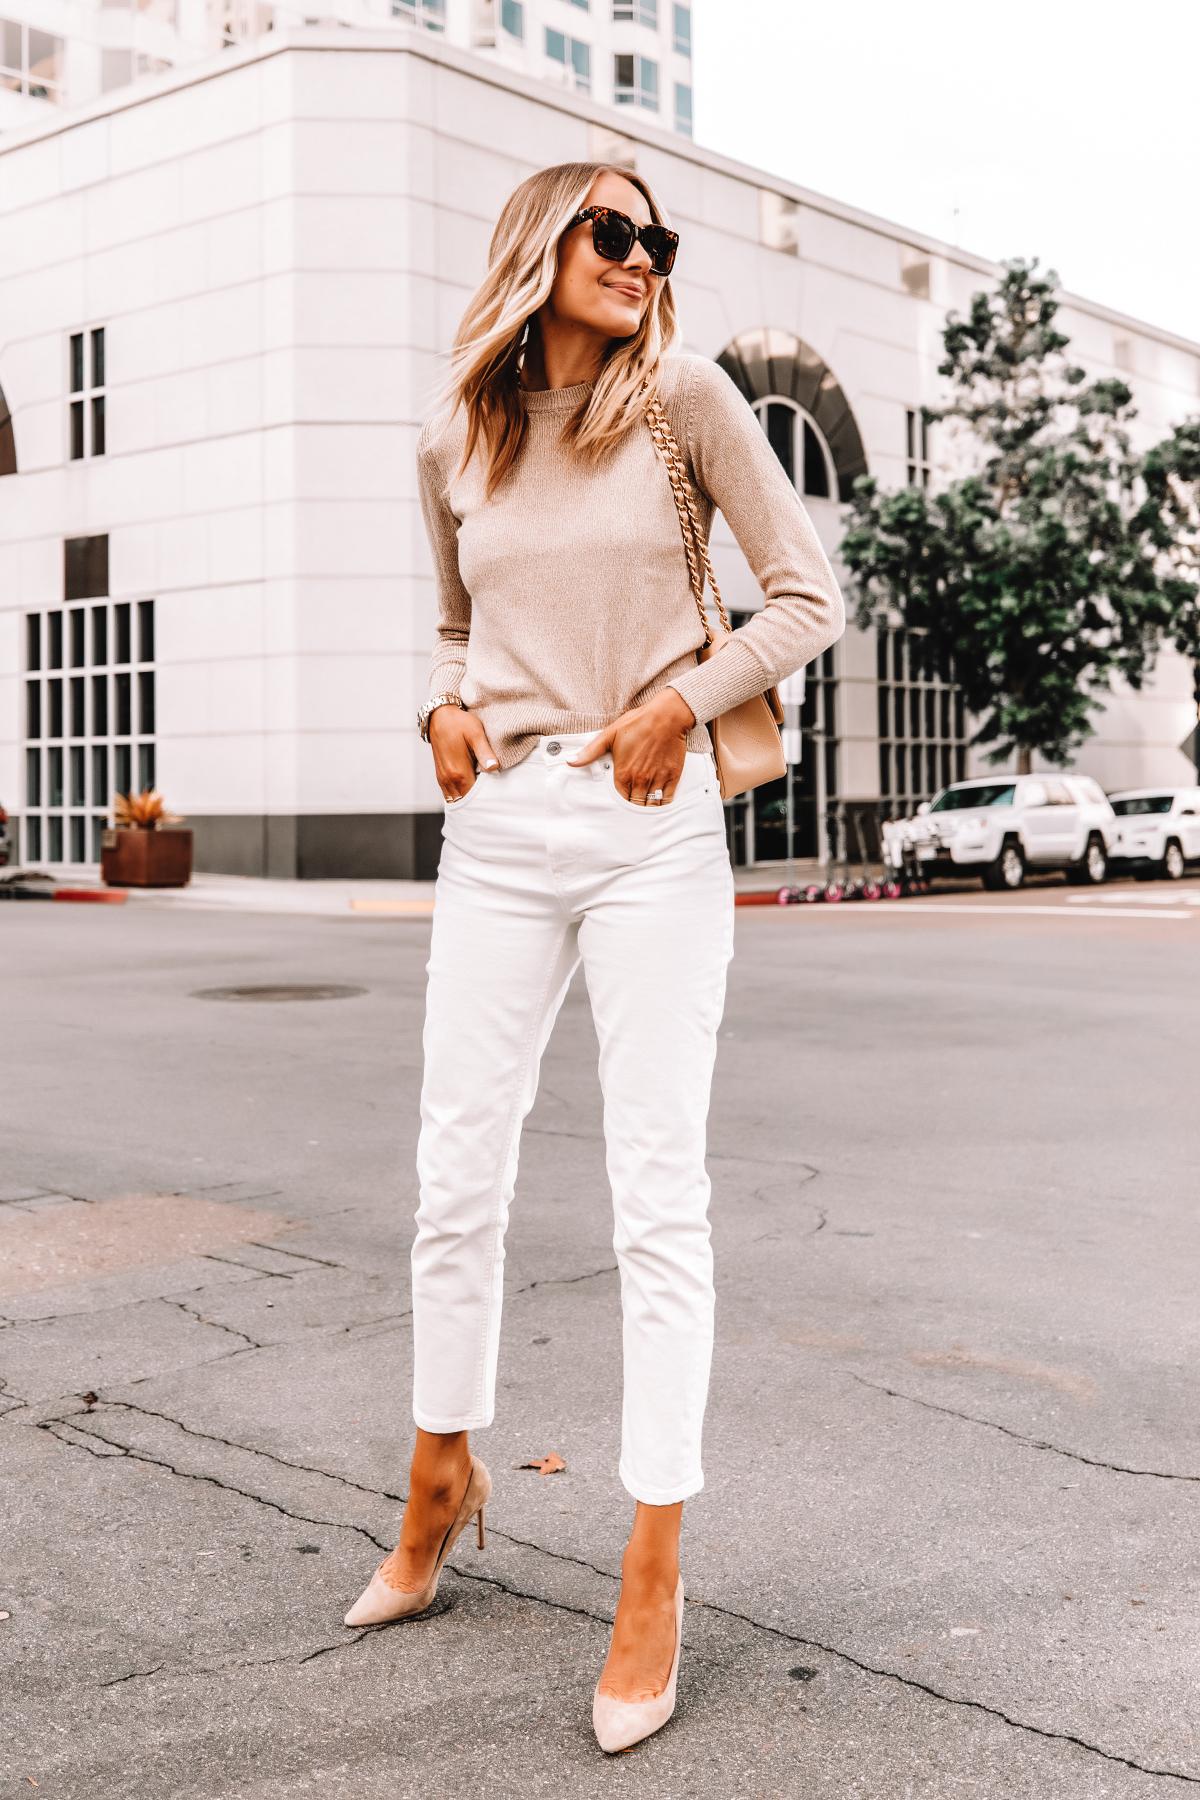 Fashion Jackson Wearing Everlane Beige Sweater White Jeans Nude Pumps Beige Chanel Handbag